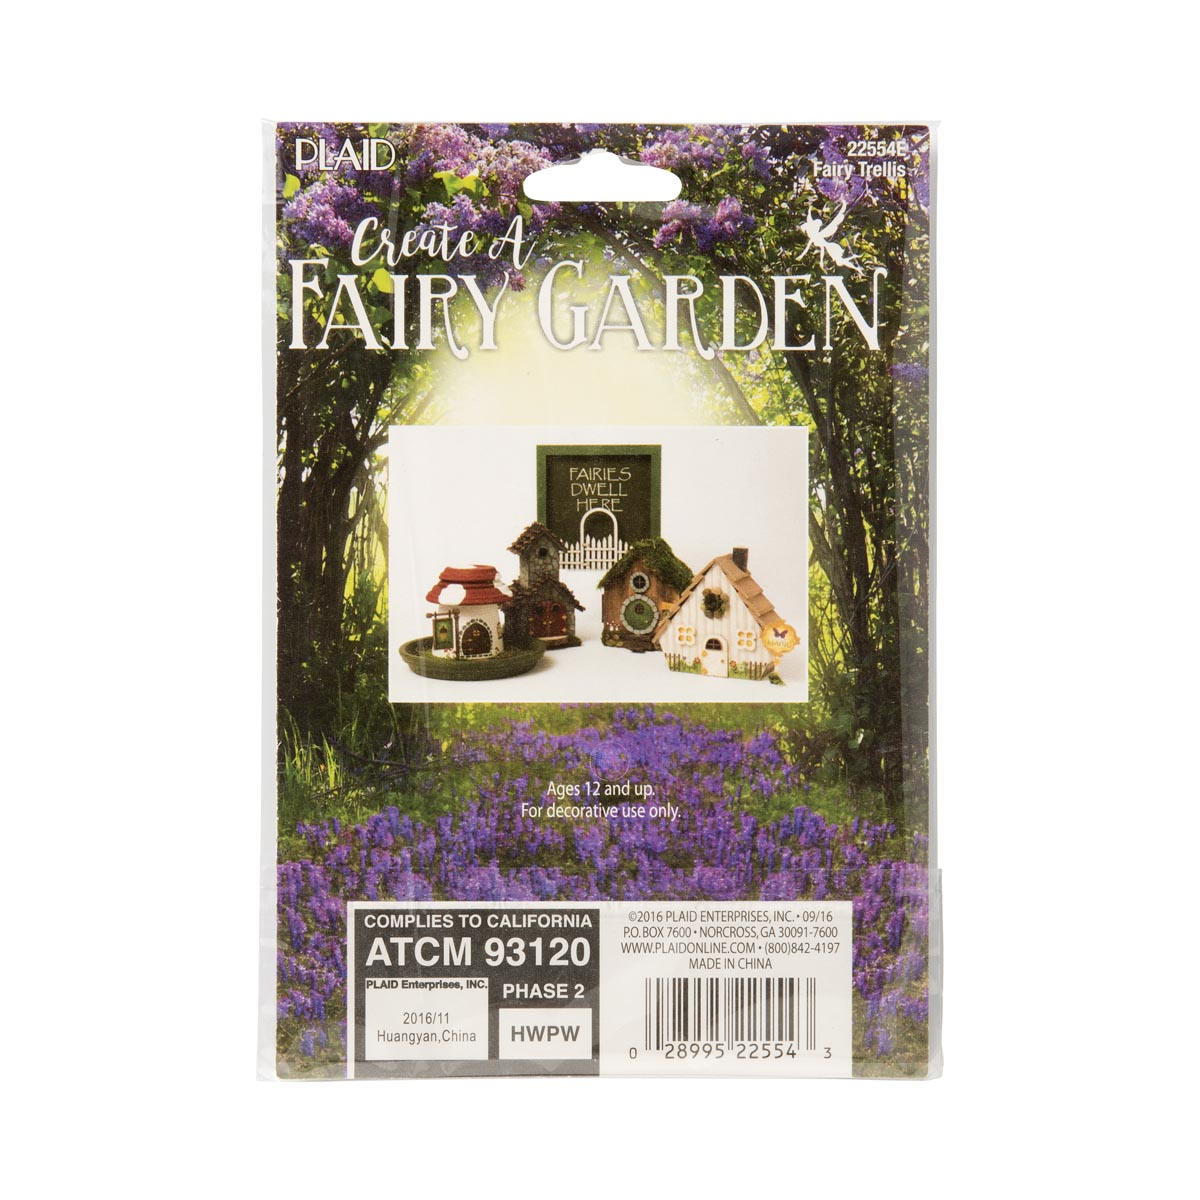 Plaid ® Wood Surfaces - Fairy Garden - Trellis